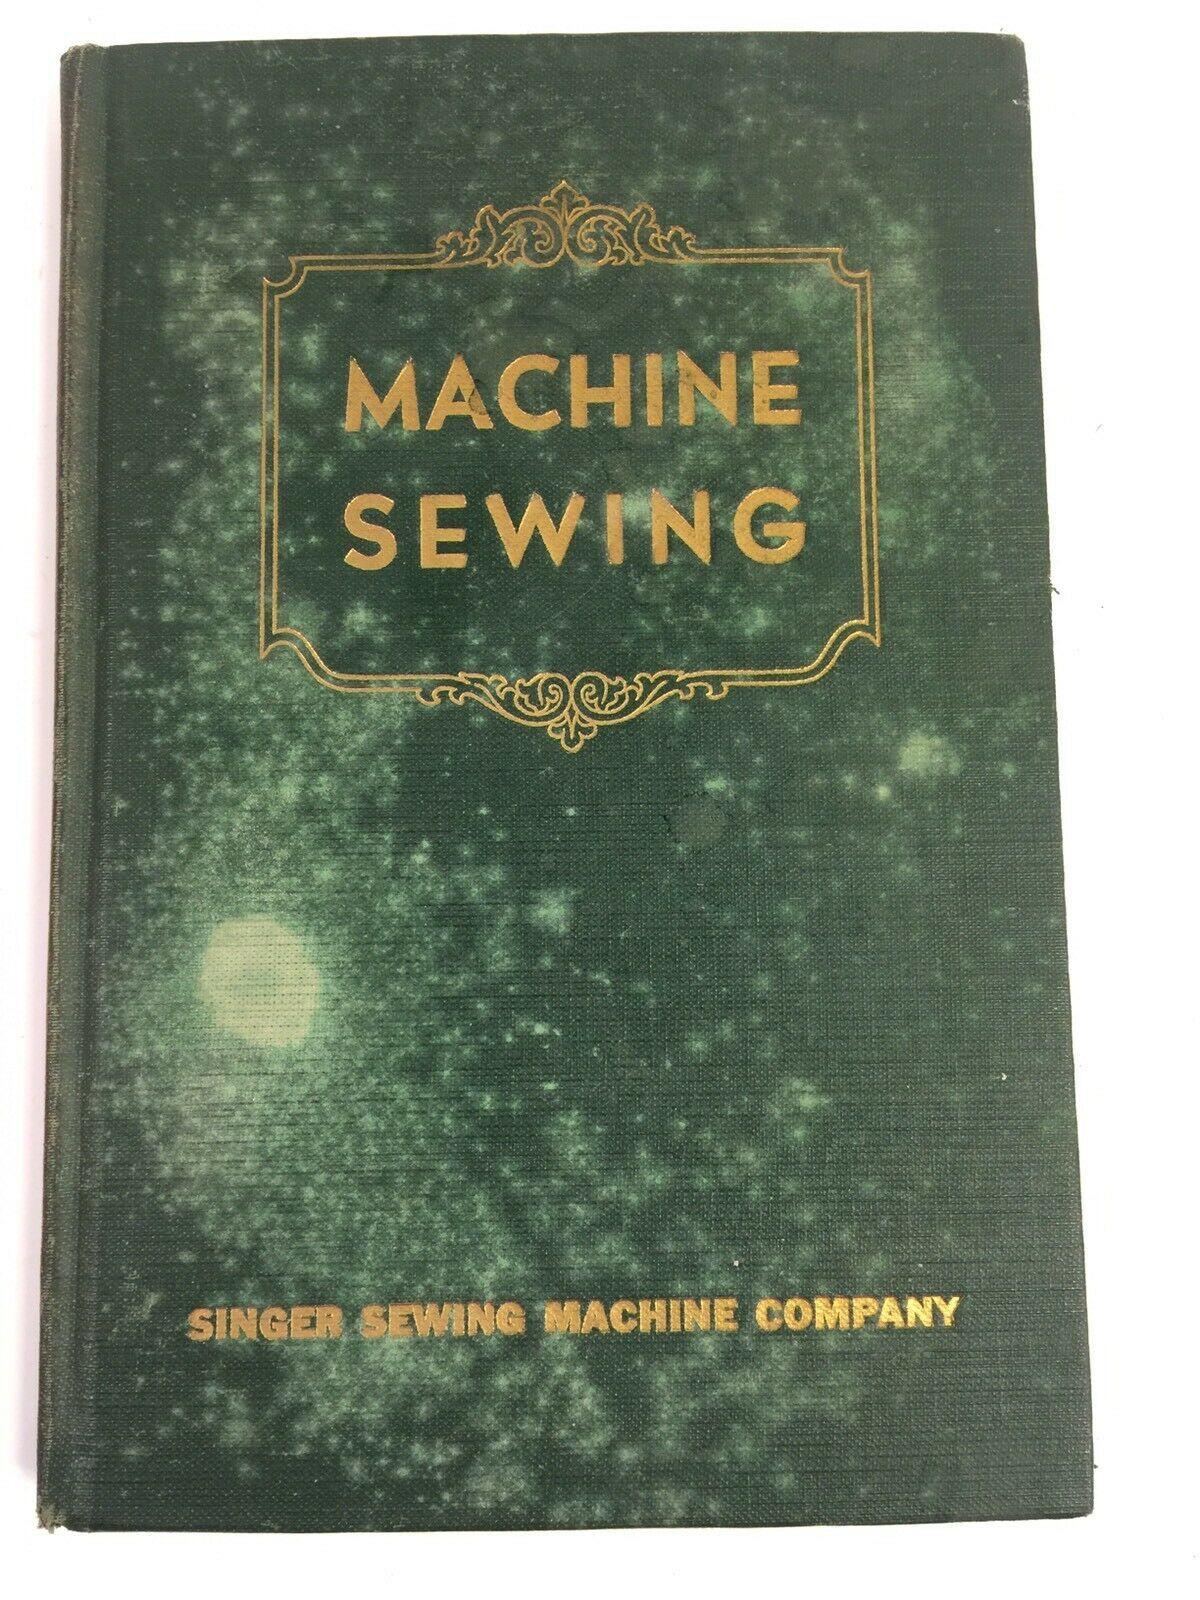 Singer Machine Sewing Vintage Teachers Home Economics School Book Featherweight - $247.49